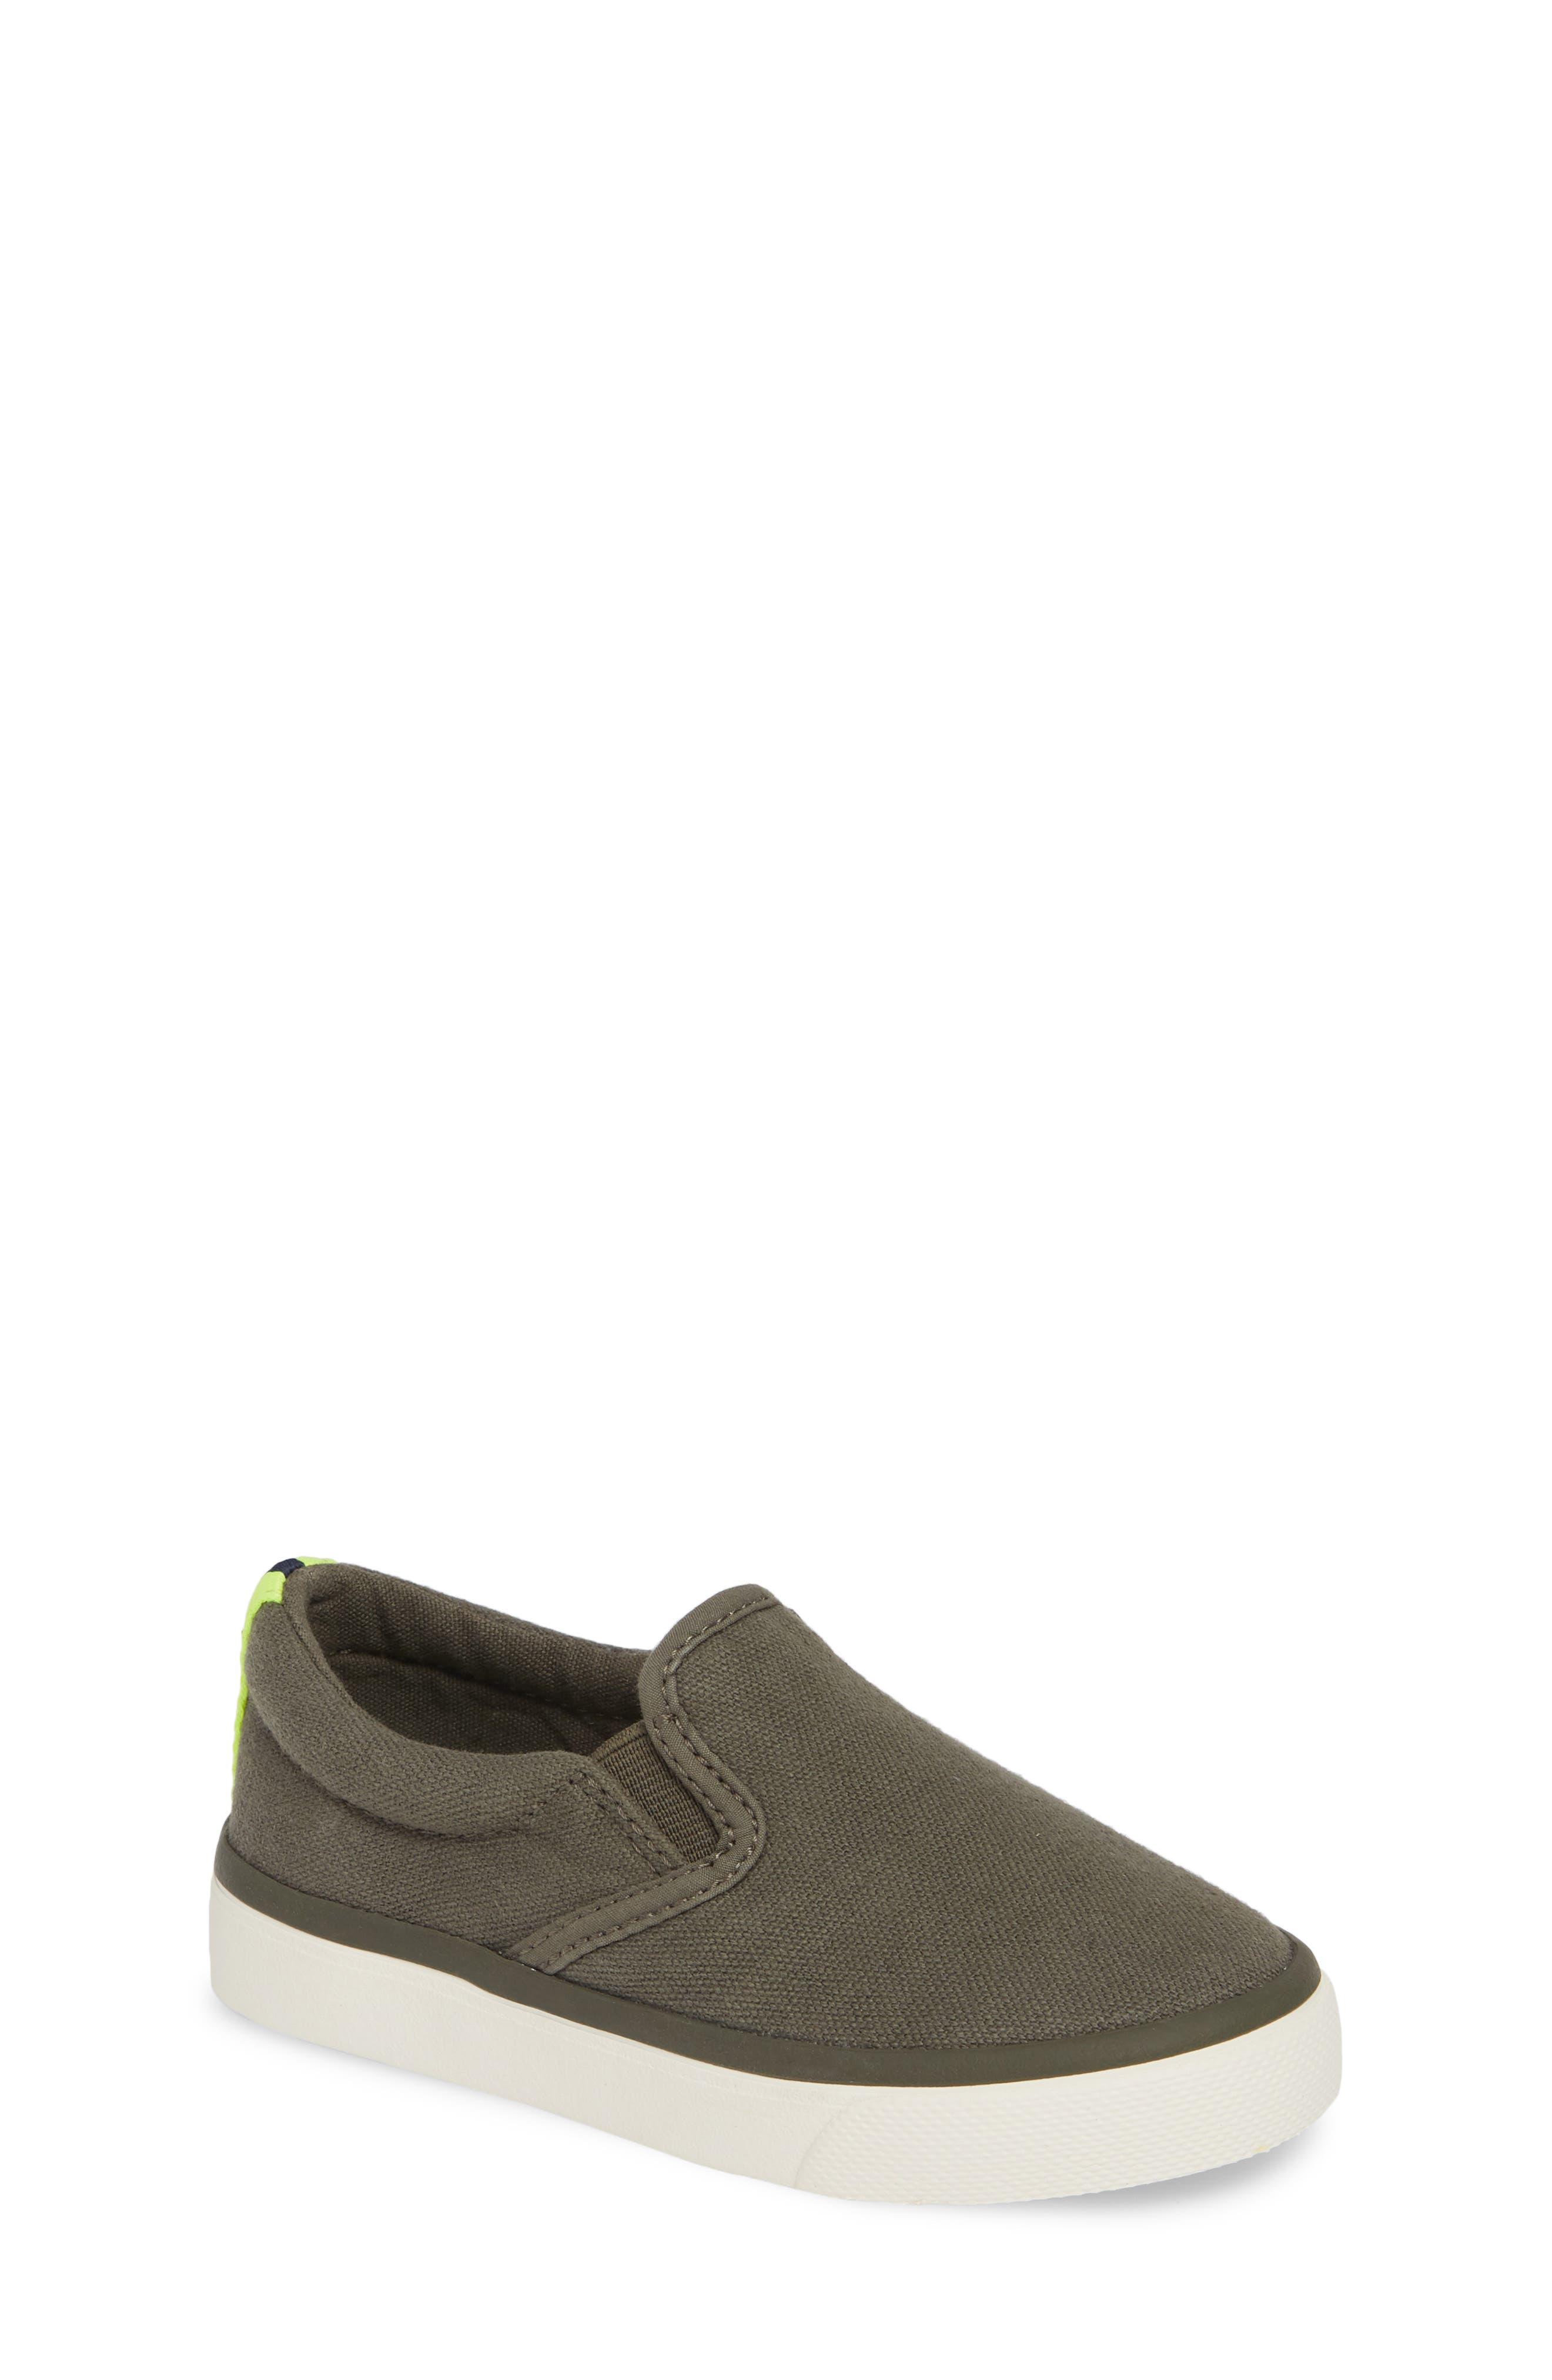 MINI BODEN,                             Slip-On Sneaker,                             Main thumbnail 1, color,                             ARMY GREEN